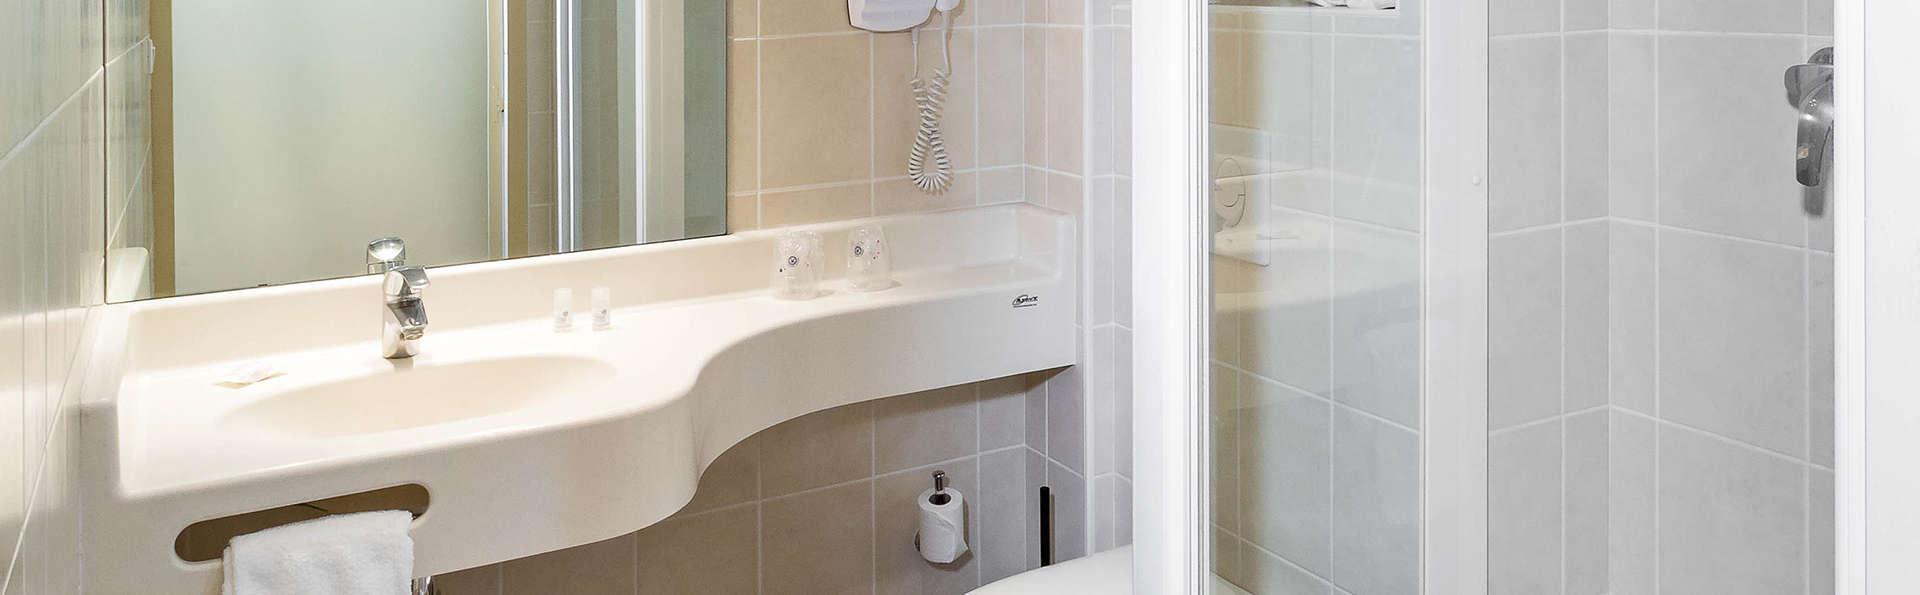 Hotel The Originals Gap Sud Le Cap (ex Inter-Hotel) - Edit_Bathroom.jpg